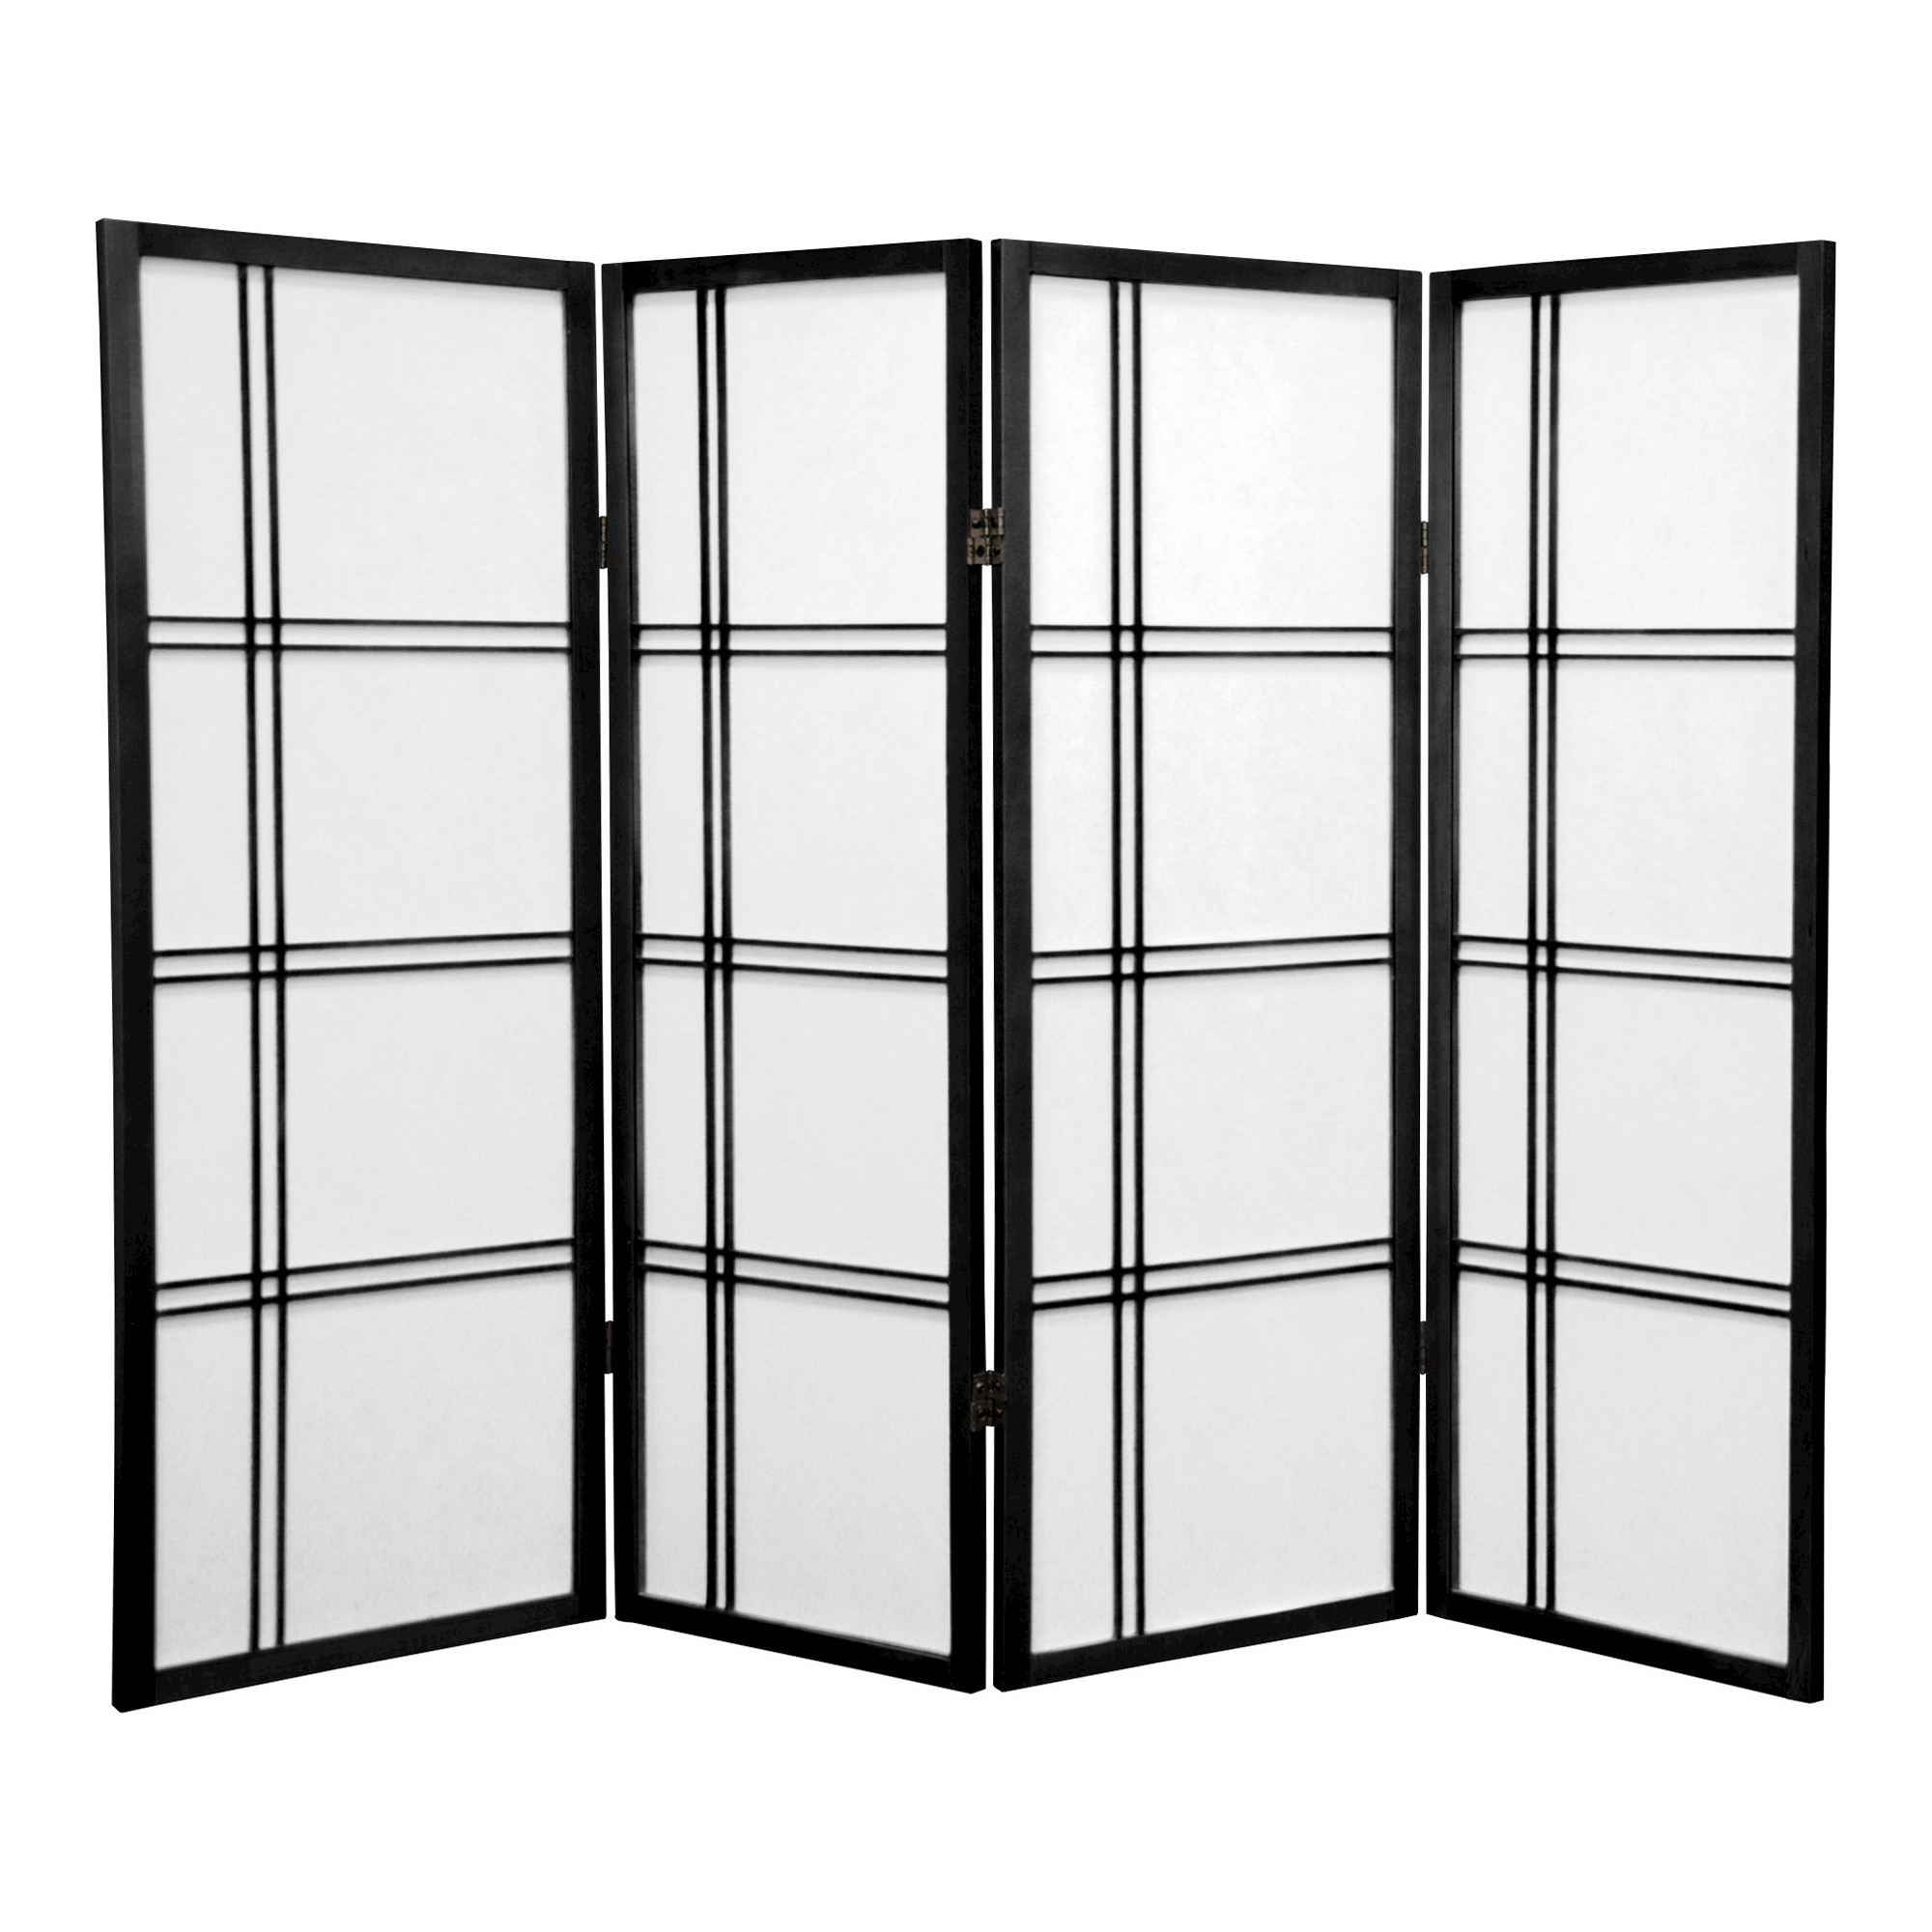 4 Ft Tall Double Cross Shoji Screen Black 4 Panels Oriental